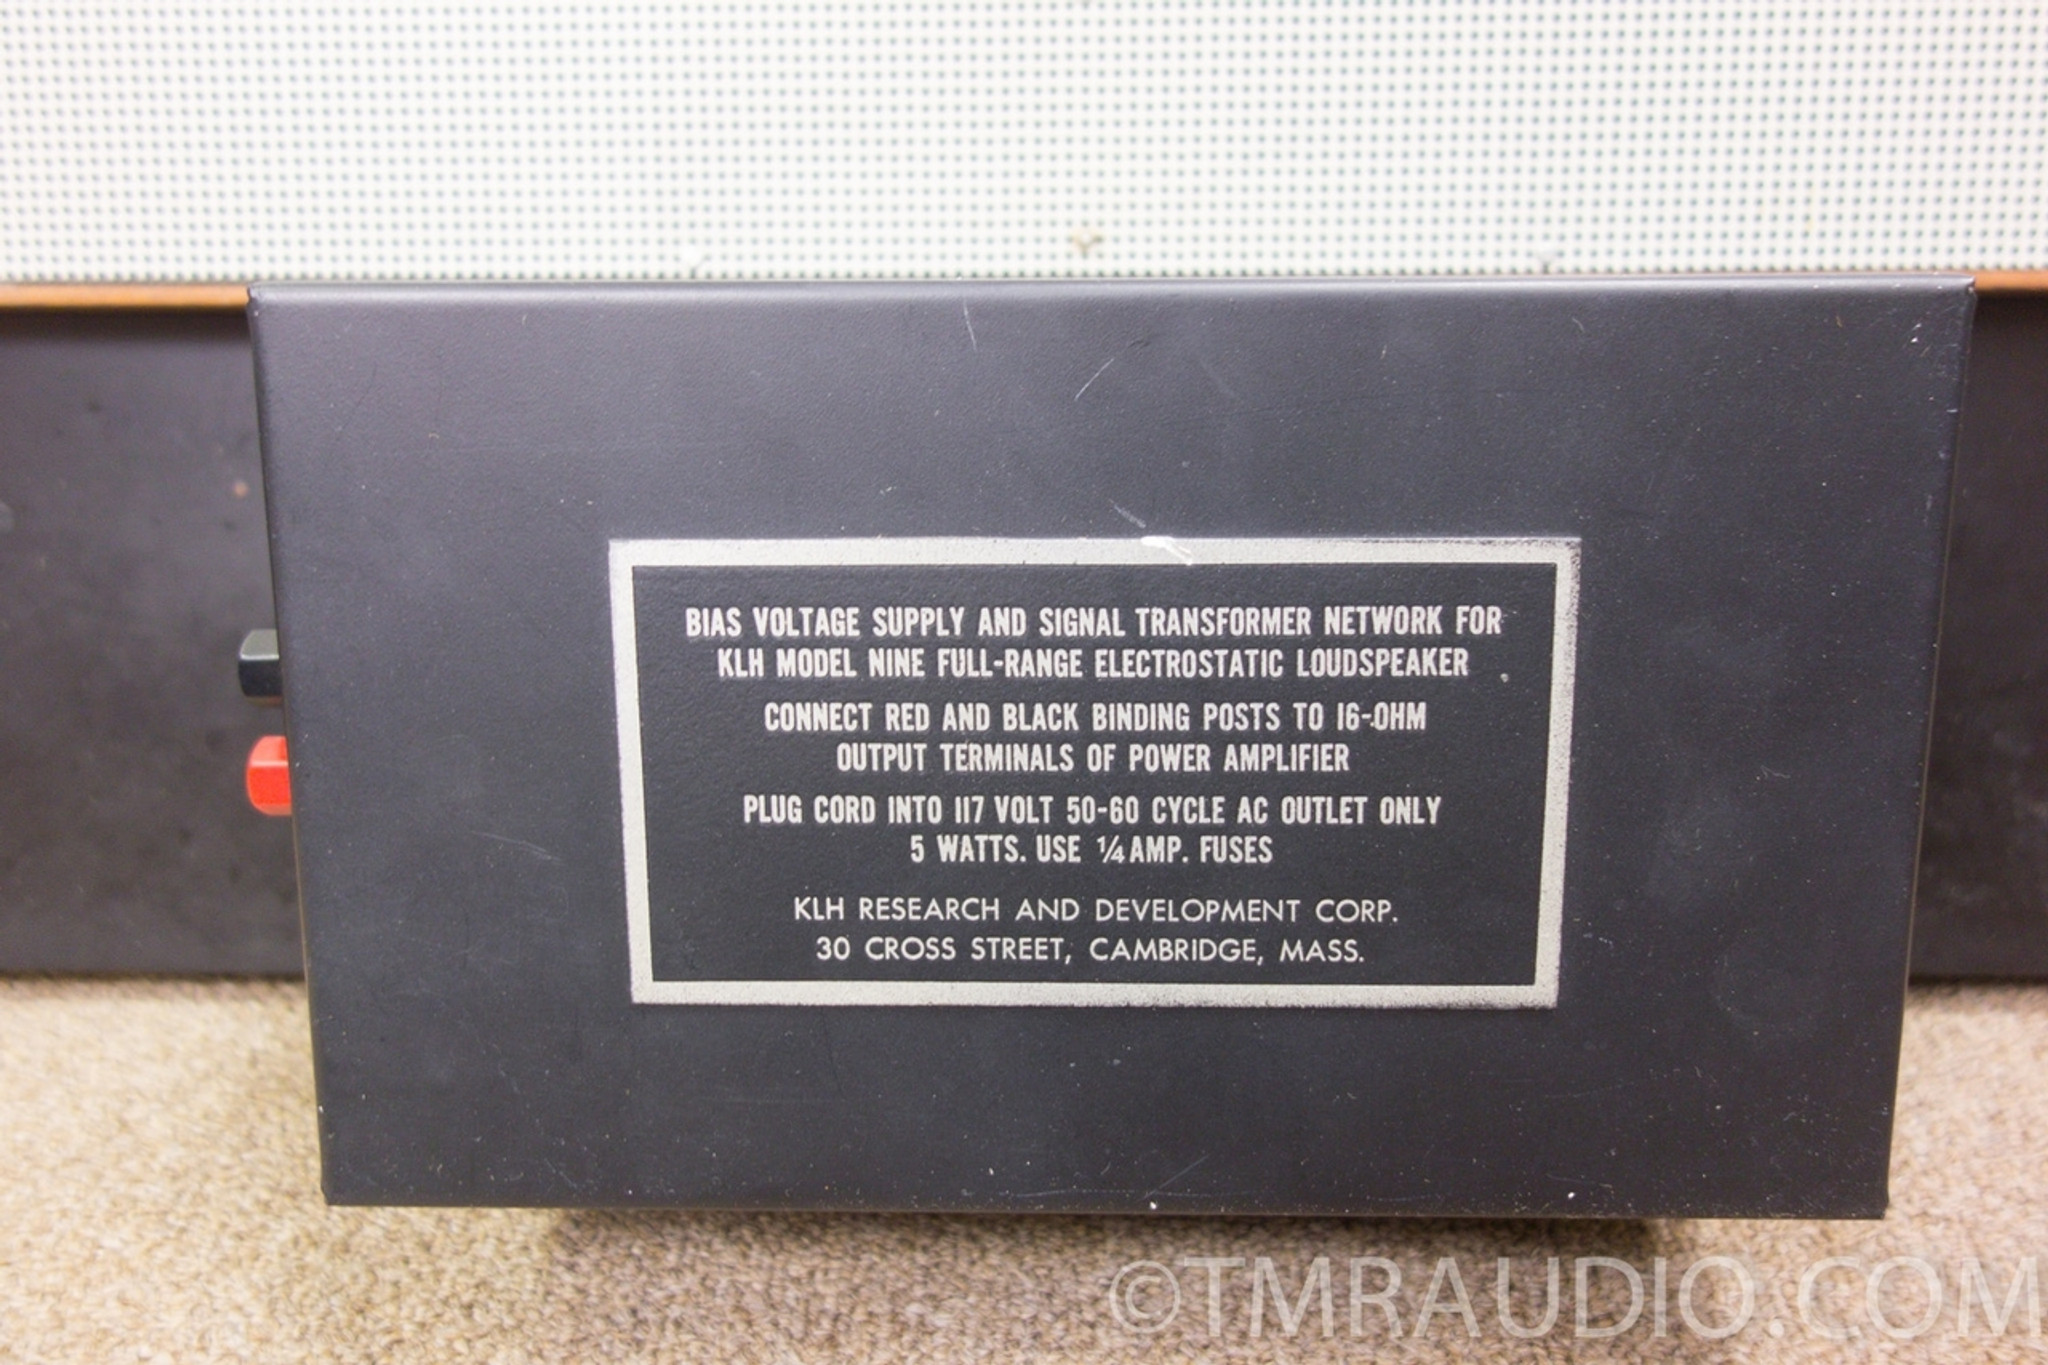 klh model 9 vintage electrostatic speakers in factory box one owner stunning klh [ 1280 x 853 Pixel ]